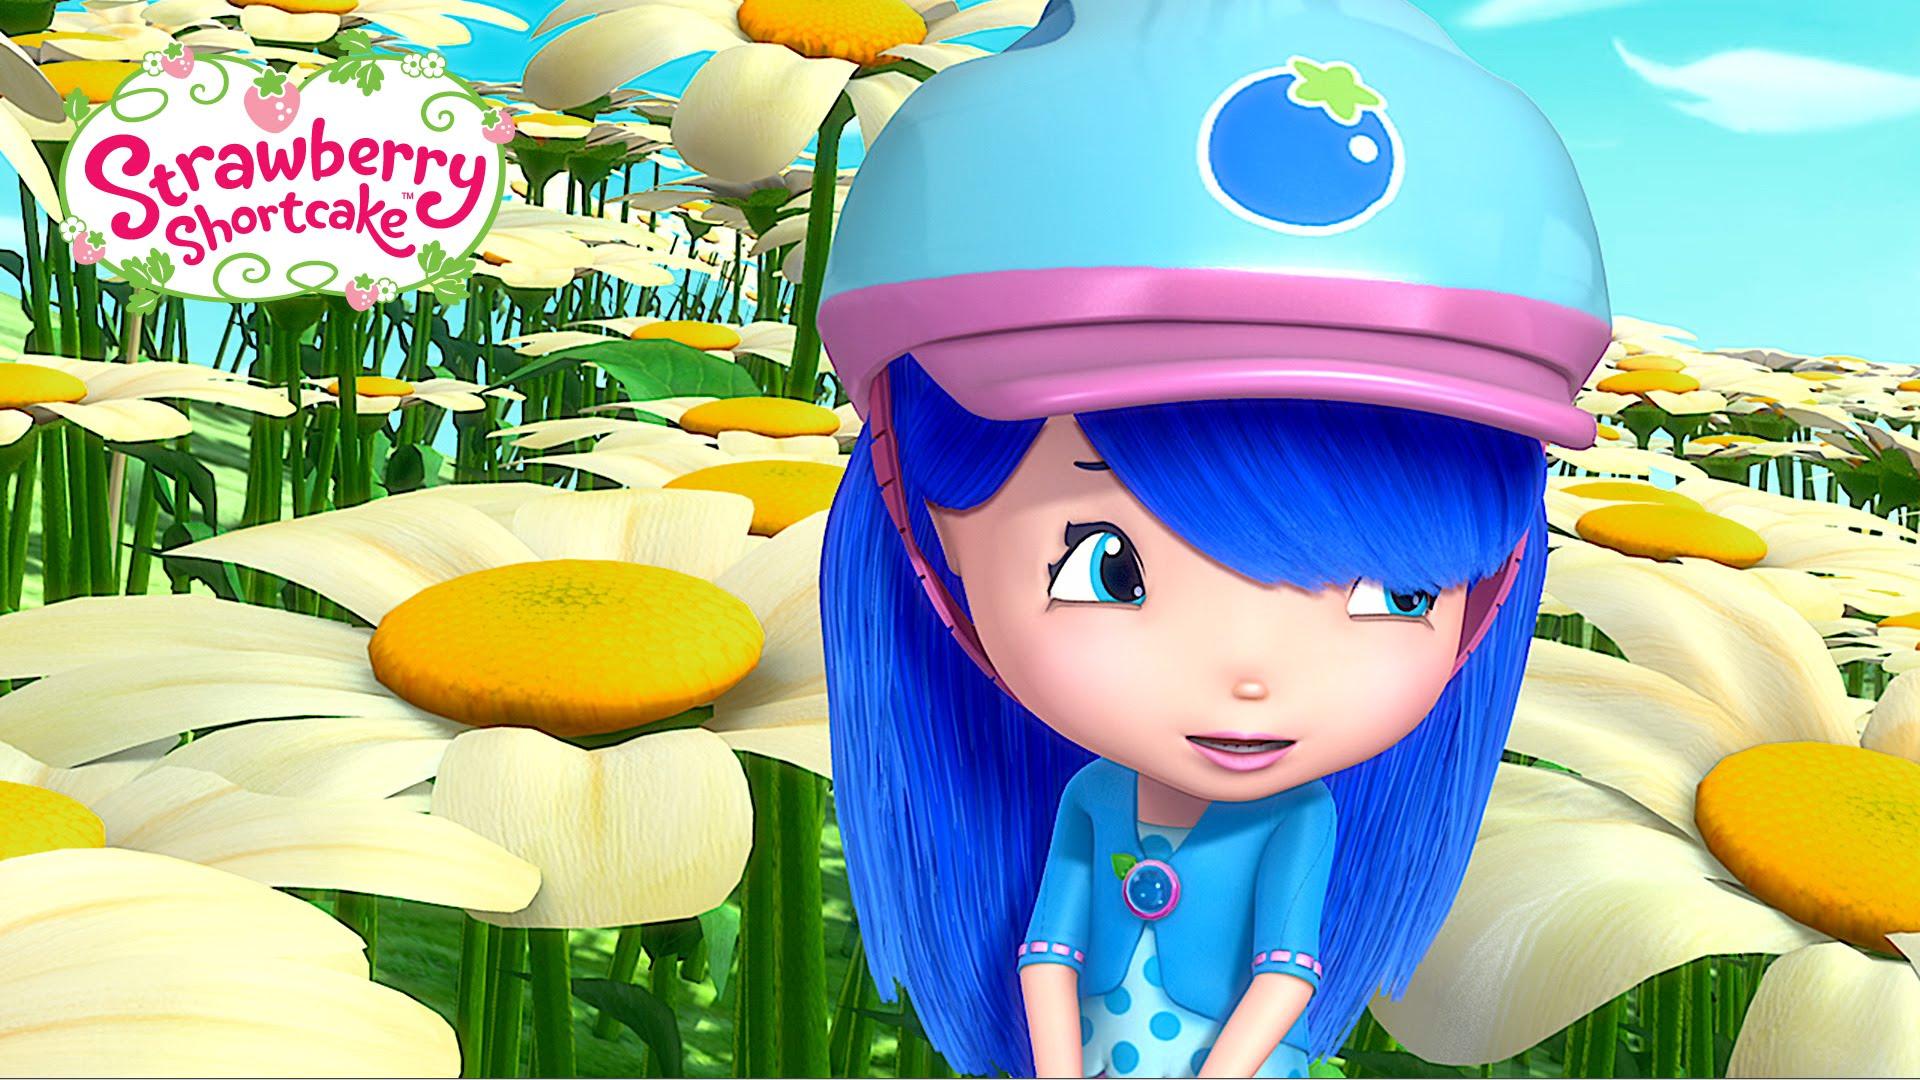 Blueberry Muffin clipart big Shortcake Strawberry YouTube Rescue